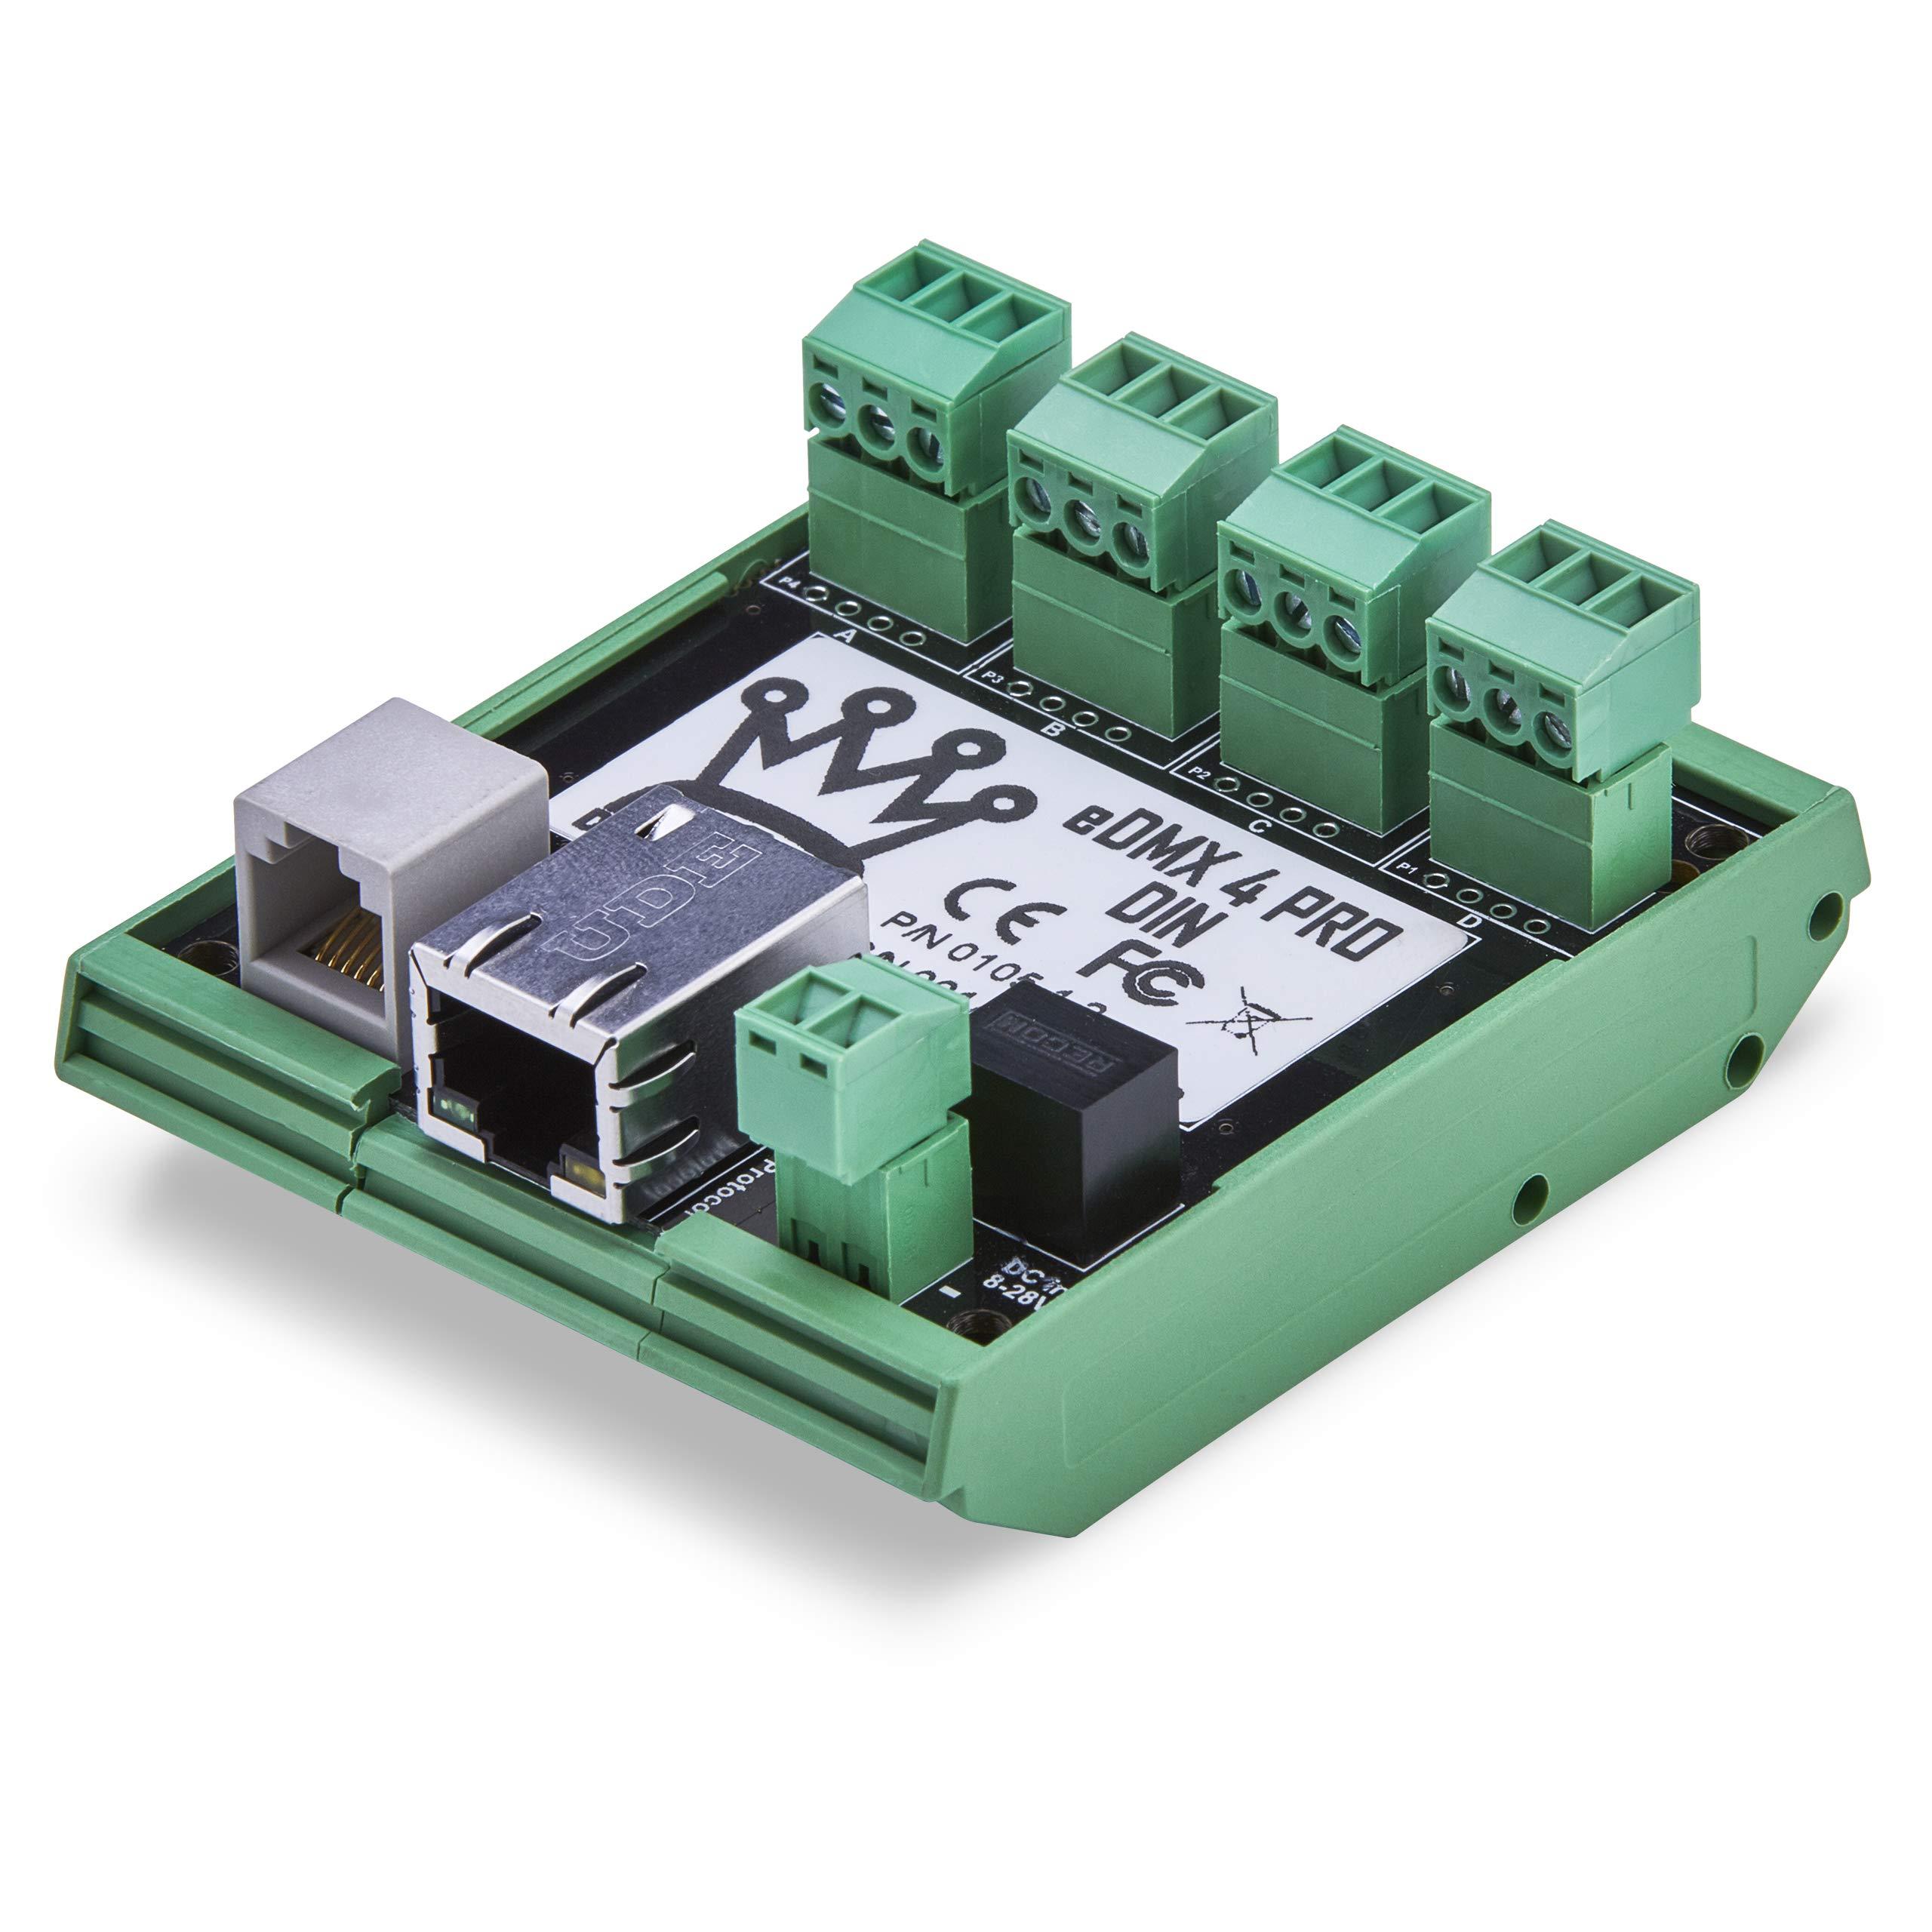 DMXking eDMX4 DIN 4-Port – ArtNet/sACN via Ethernet to DMX 512 Converter with Screw Connectors